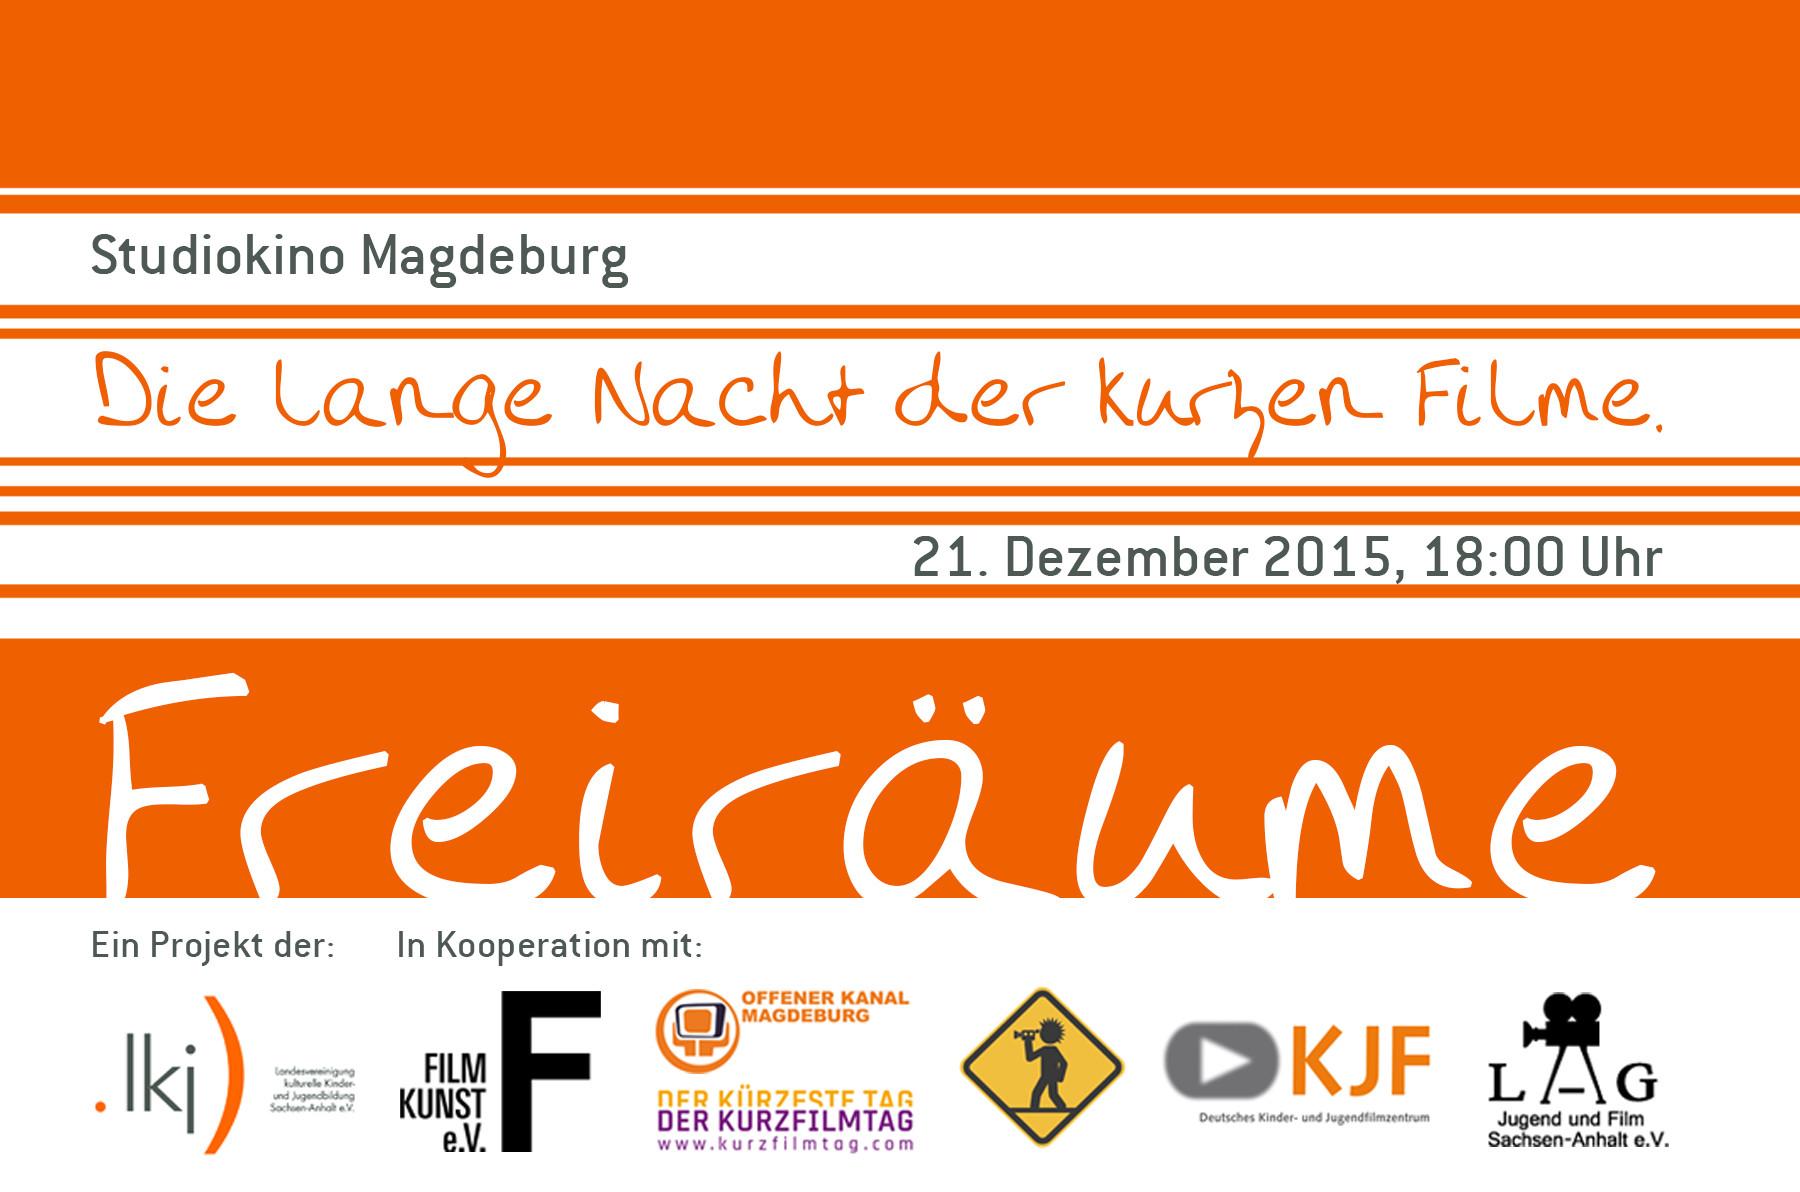 teaser-filmnacht-freiraeume18